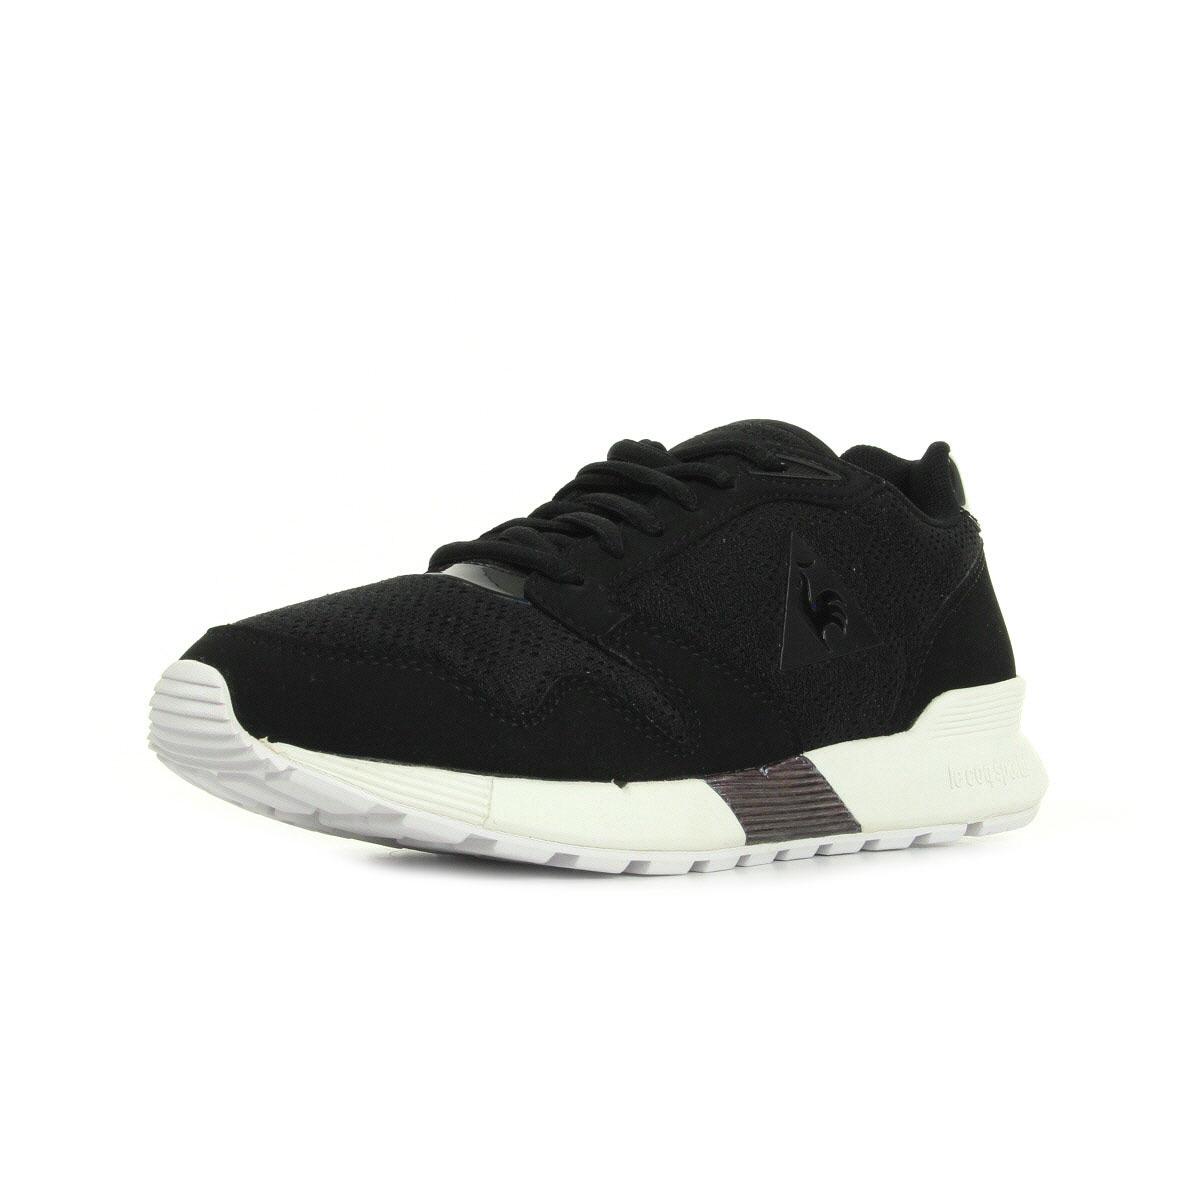 le coq sportif omega x oil 1710750 chaussures homme homme. Black Bedroom Furniture Sets. Home Design Ideas